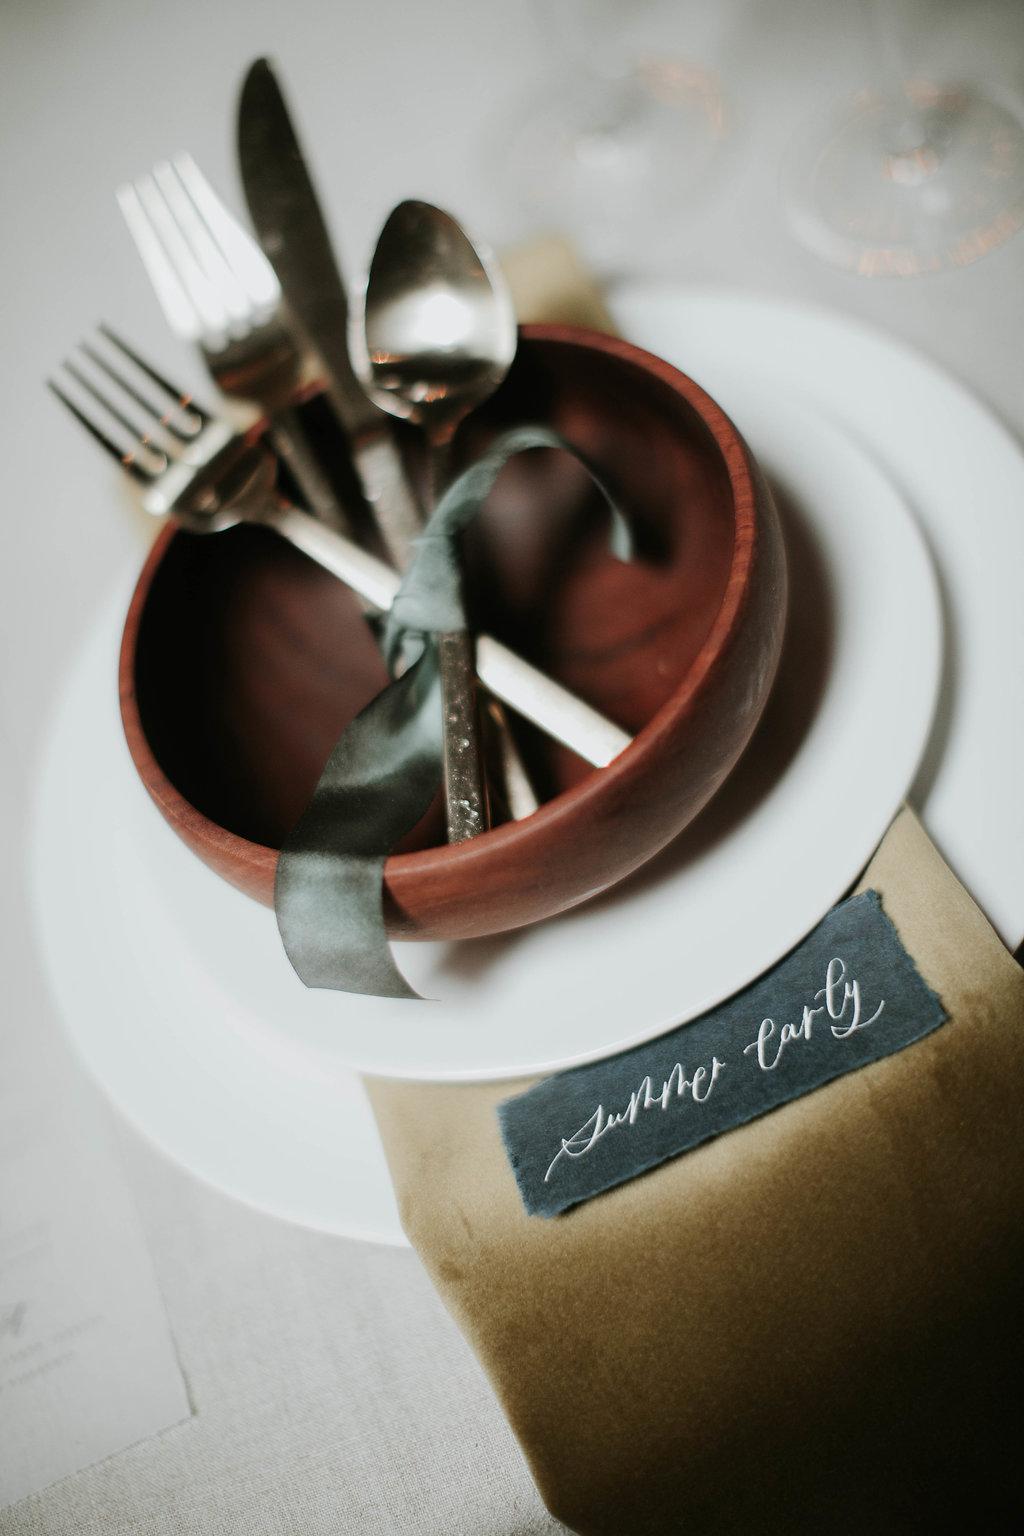 The_Big_Fake_wedding_Seattle_Within_sodo_wedding_by_Adina_Preston_Weddings_2.JPG